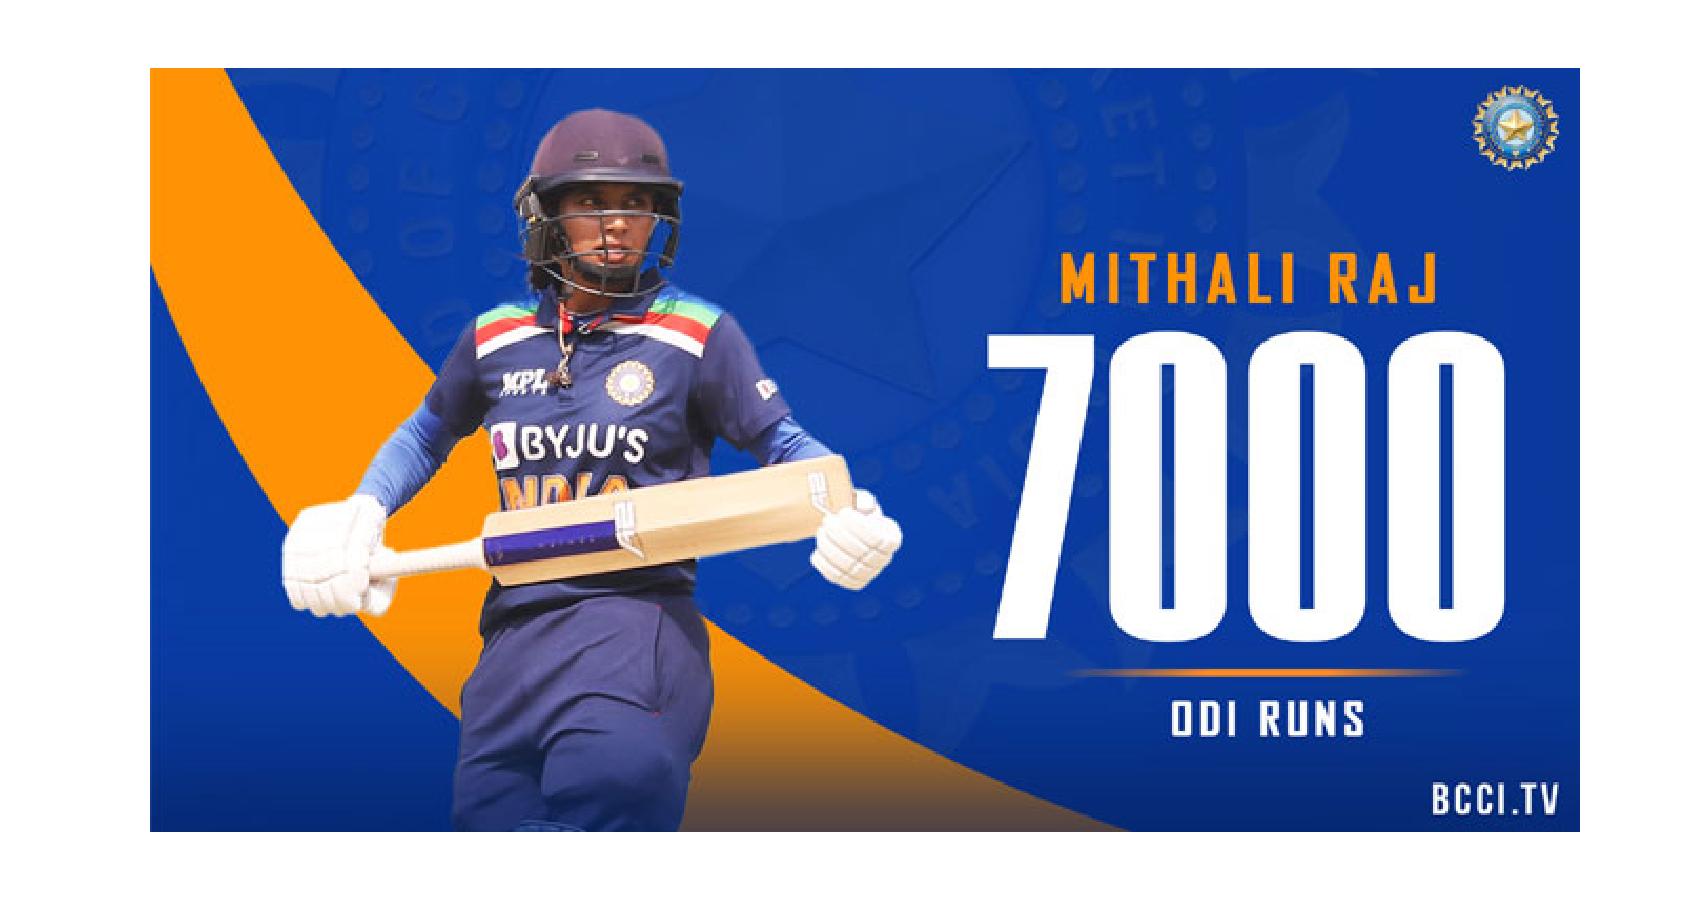 Mithali Raj, 1st Woman Cricketer To Complete 7,000 ODI Runs